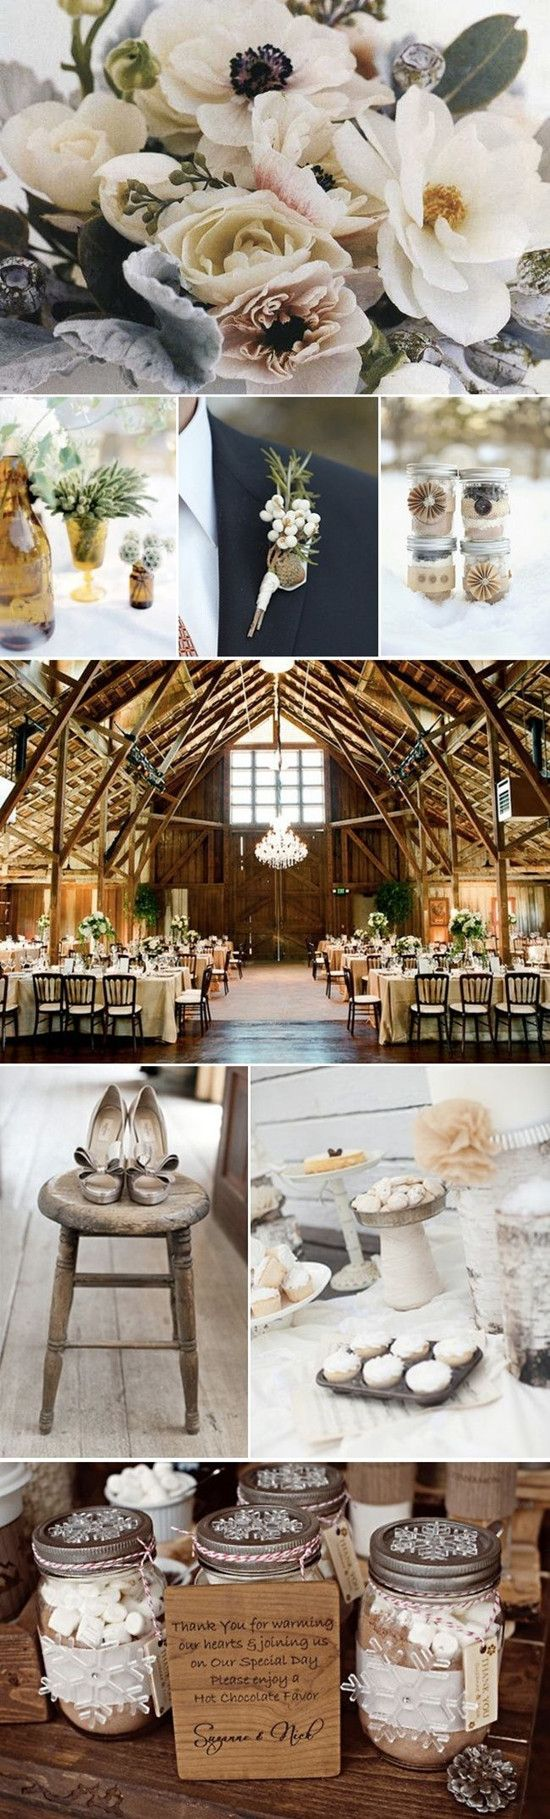 Top 5 Winter Wedding Ideas and Invitations